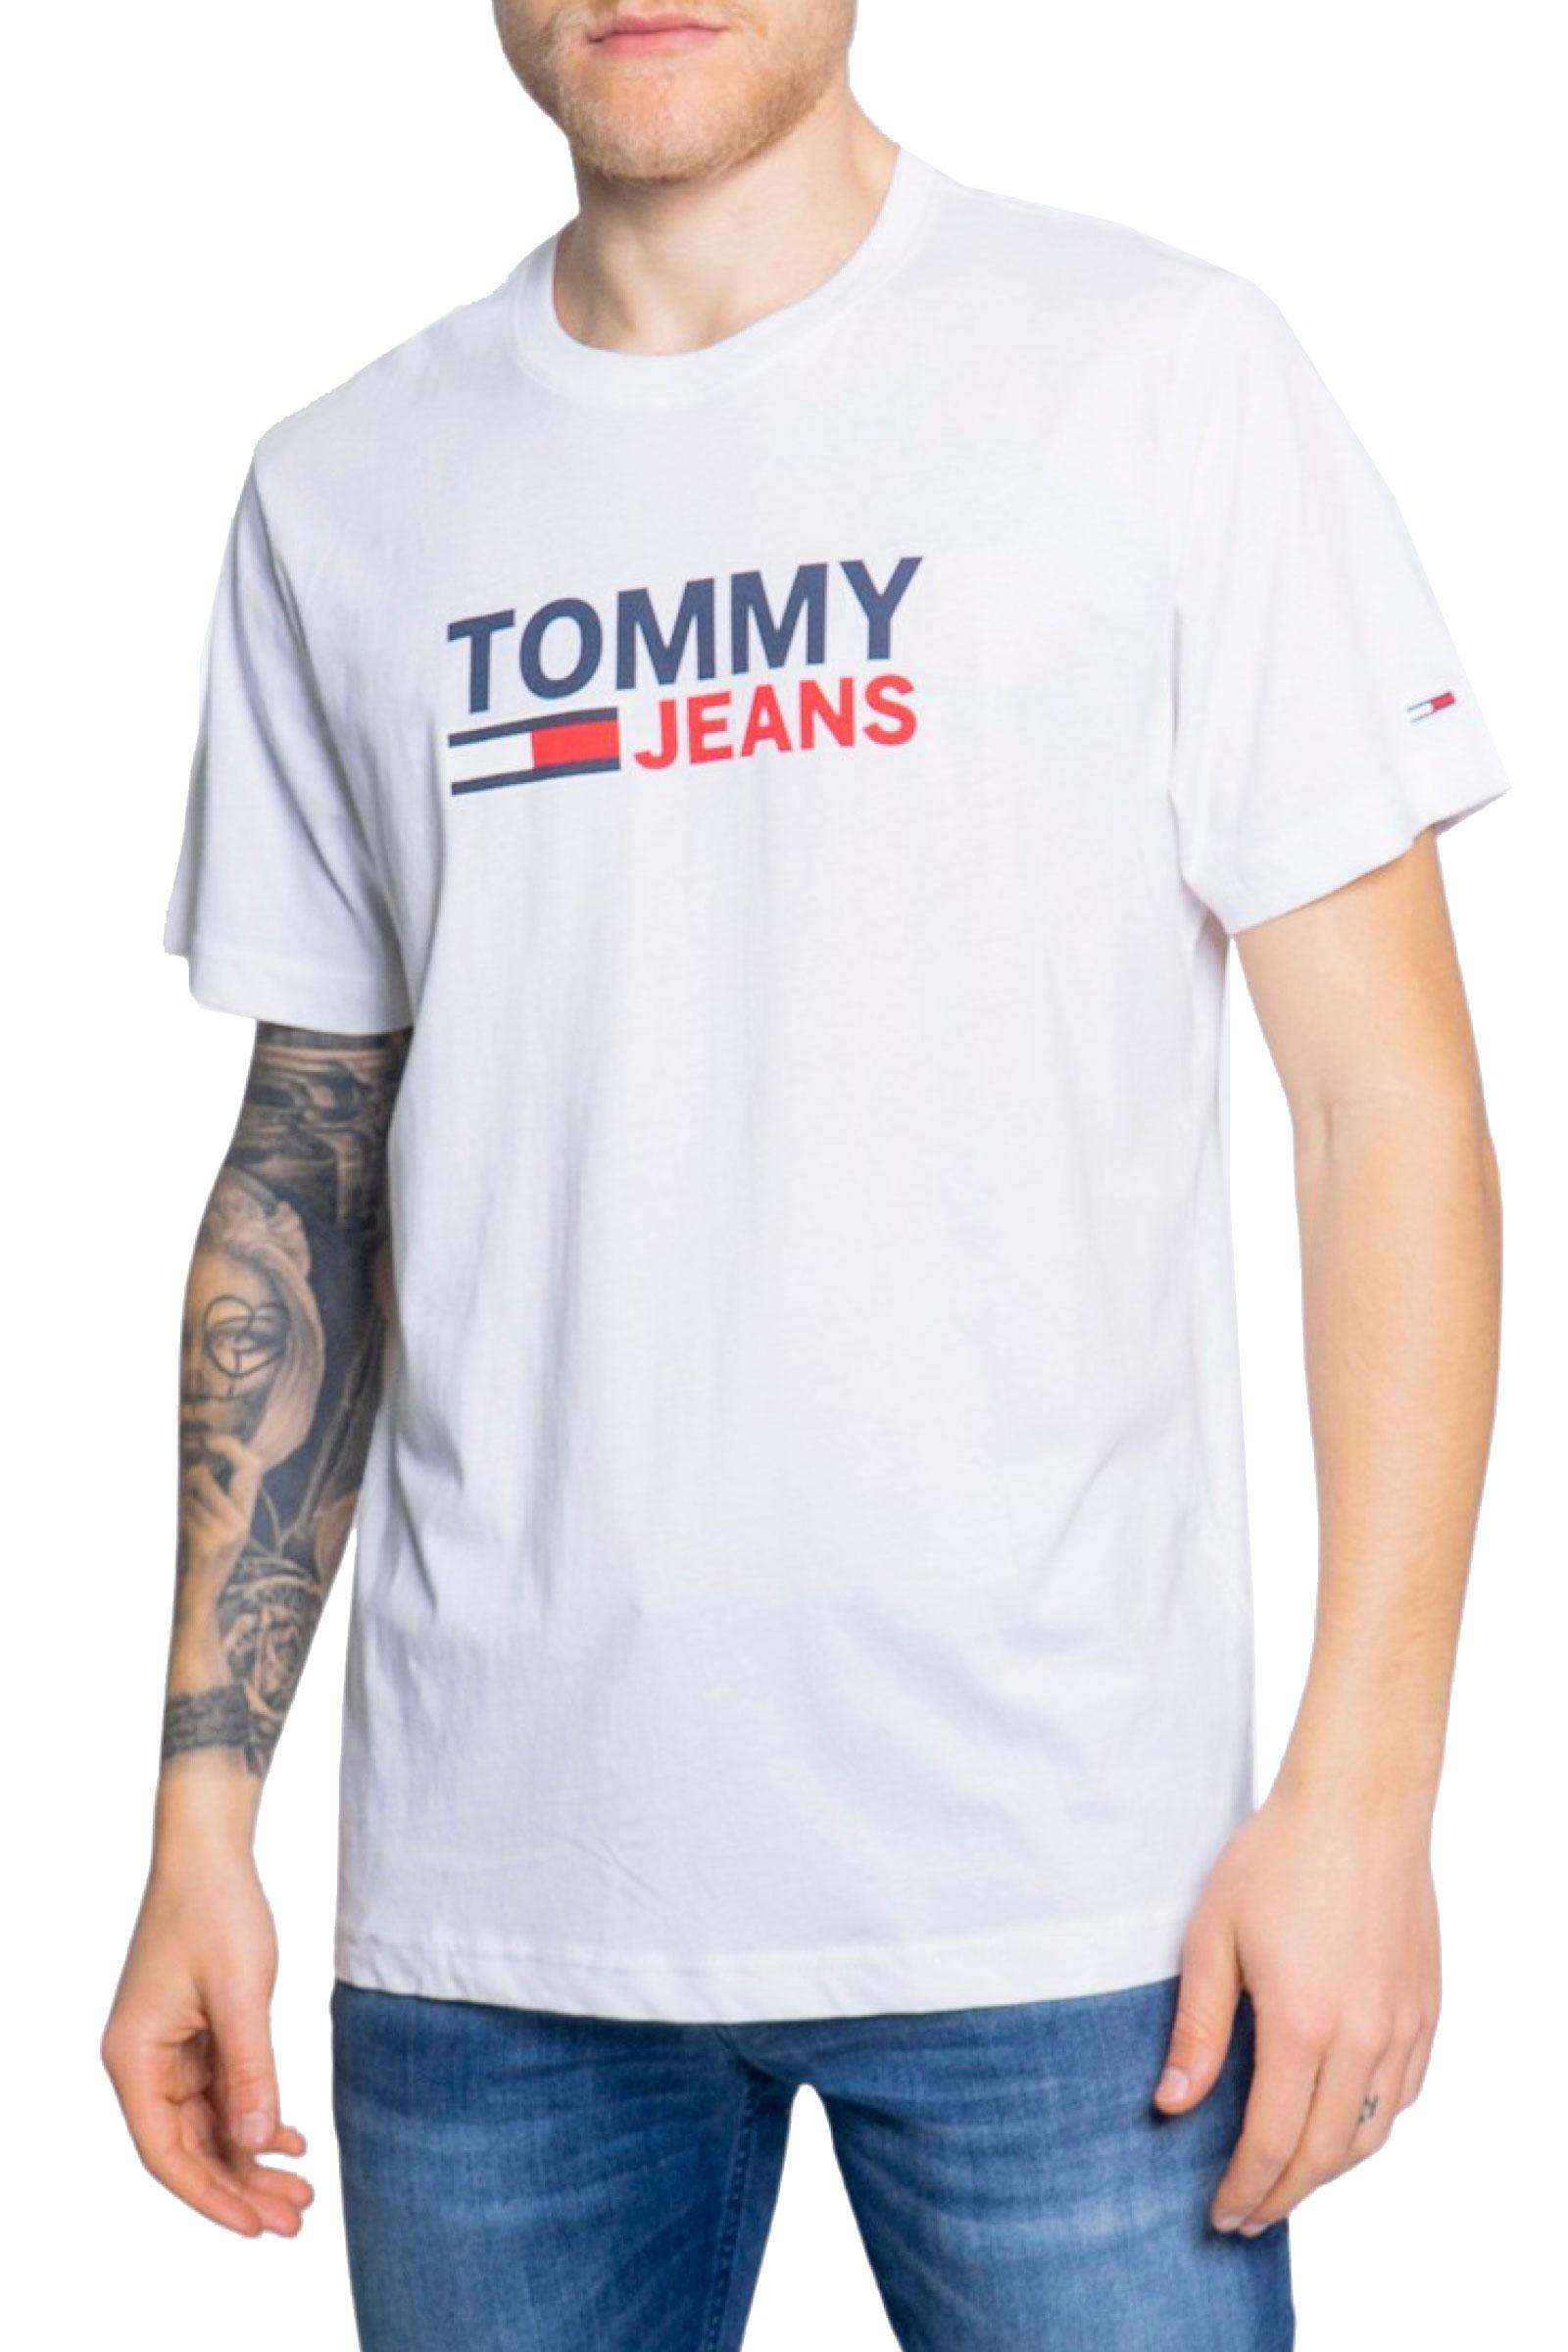 TOMMY JEANS T-Shirt Uomo TOMMY JEANS   T-Shirt   DM0DM10214YBR